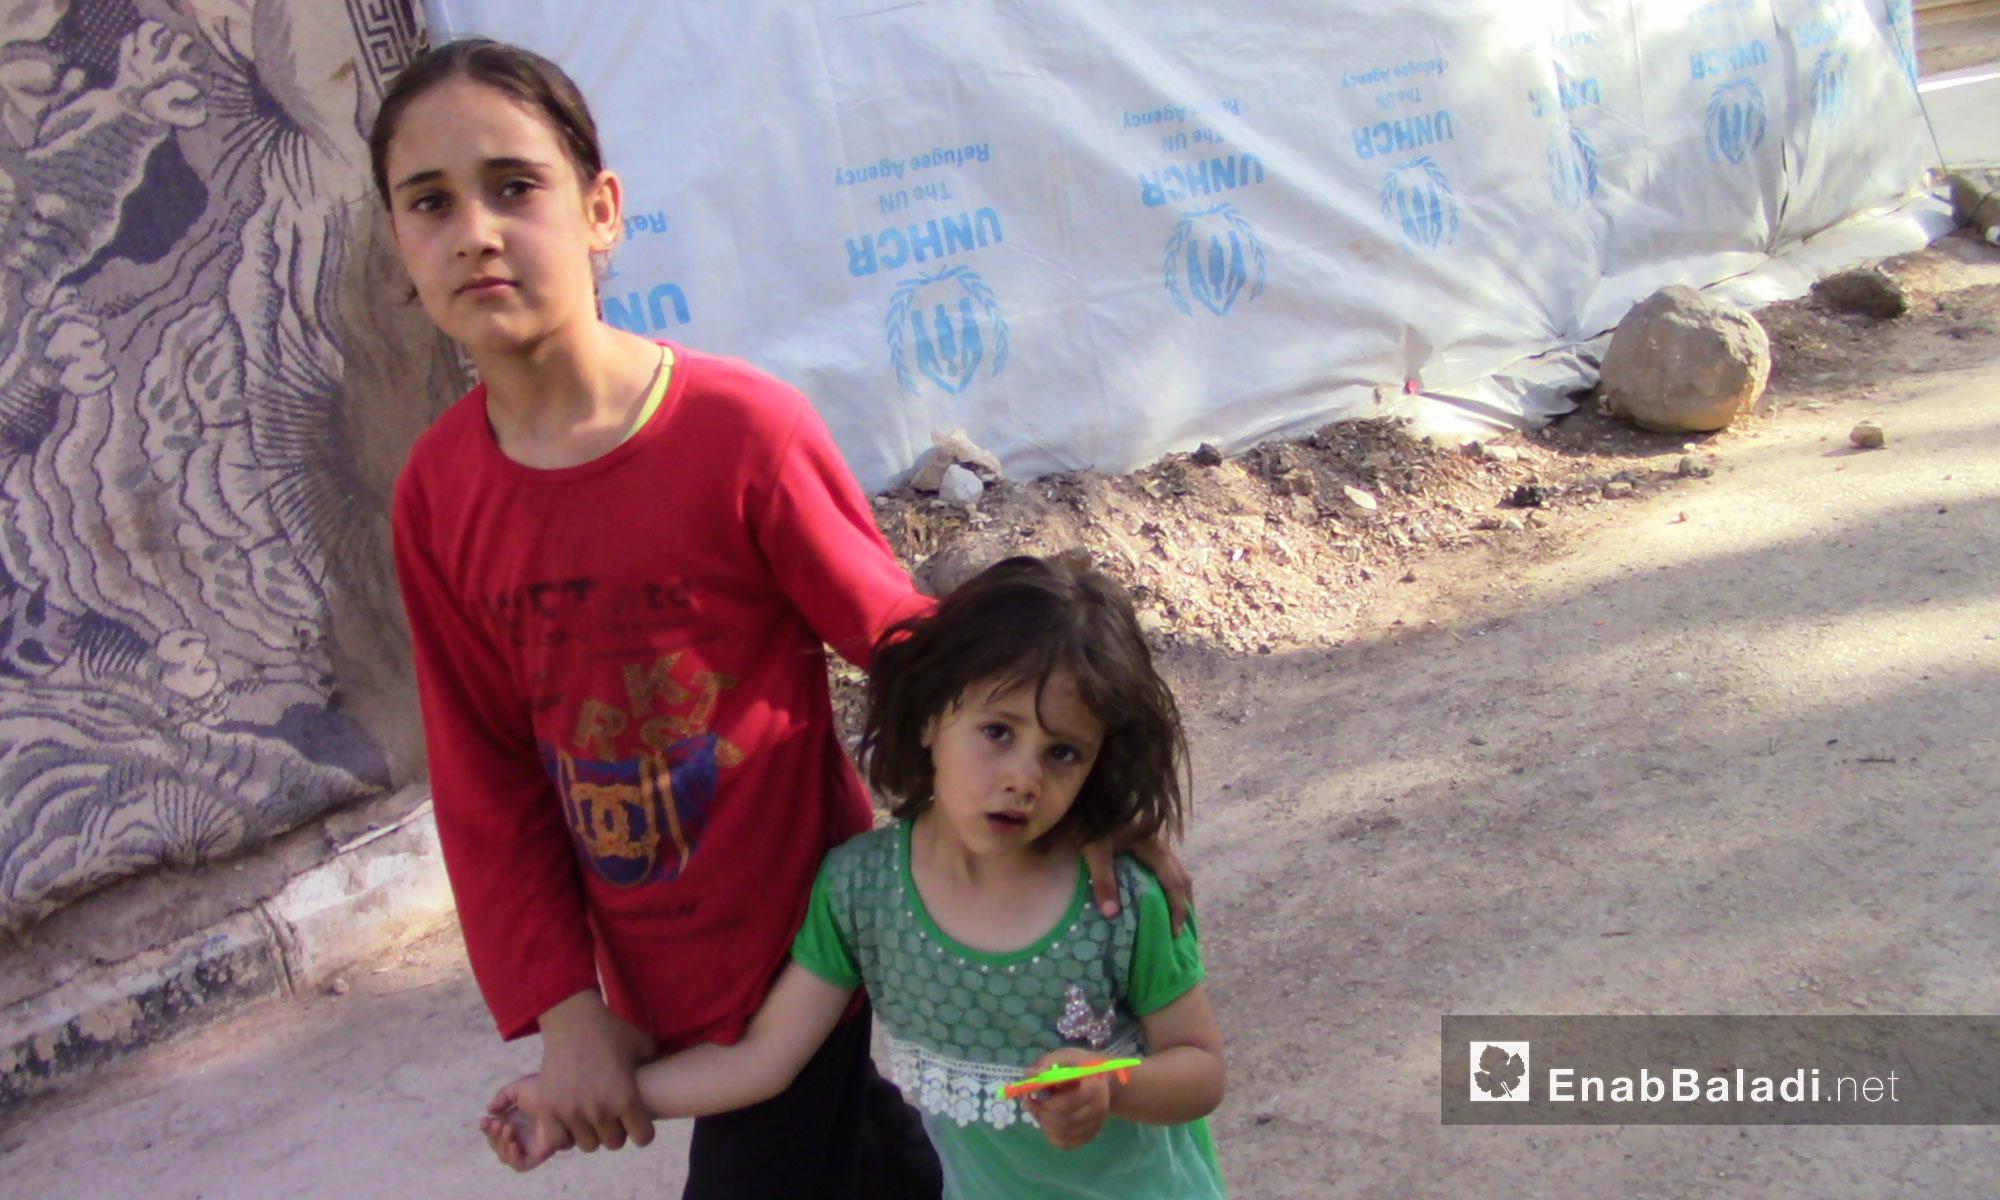 Children displaced from rural Daraa – June 26, 2018 (Enab Baladi)